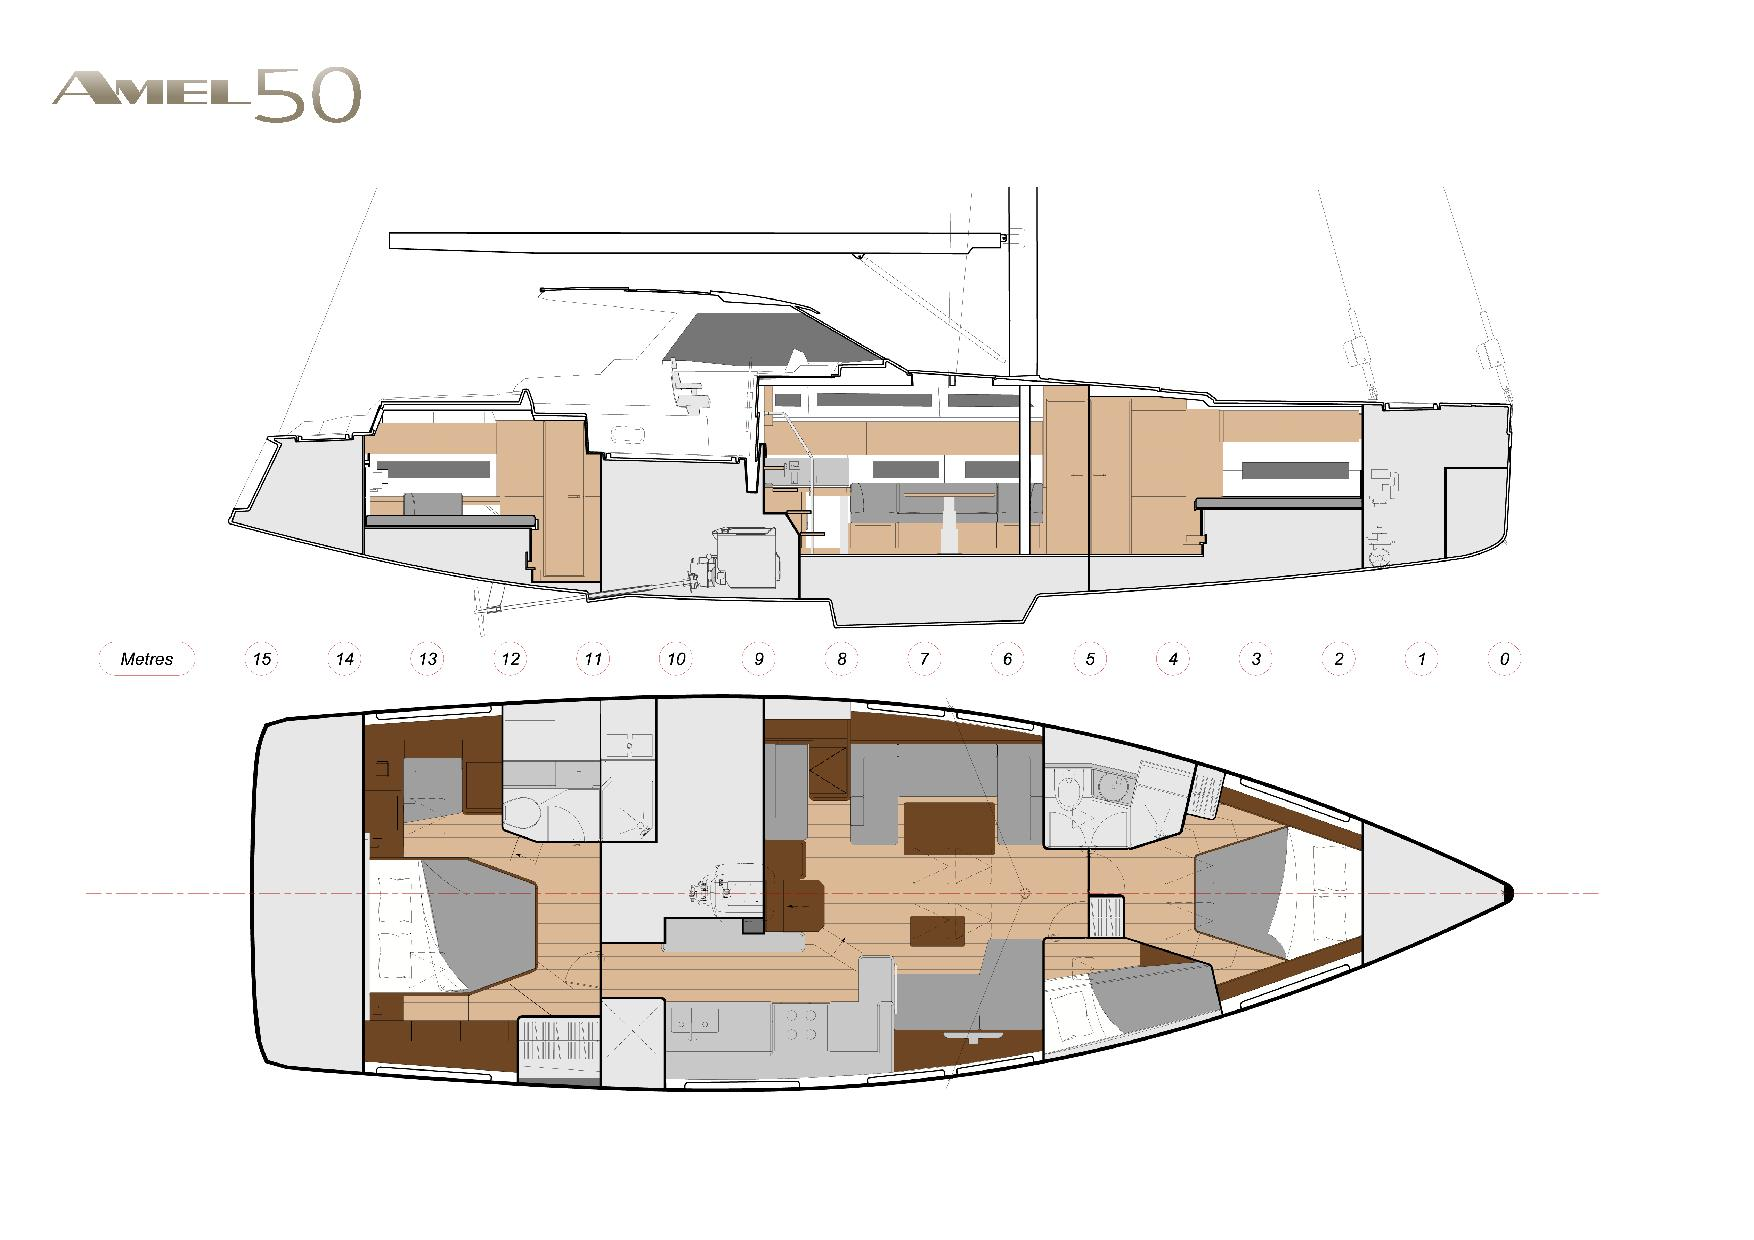 AMEL 50 - Layout 2